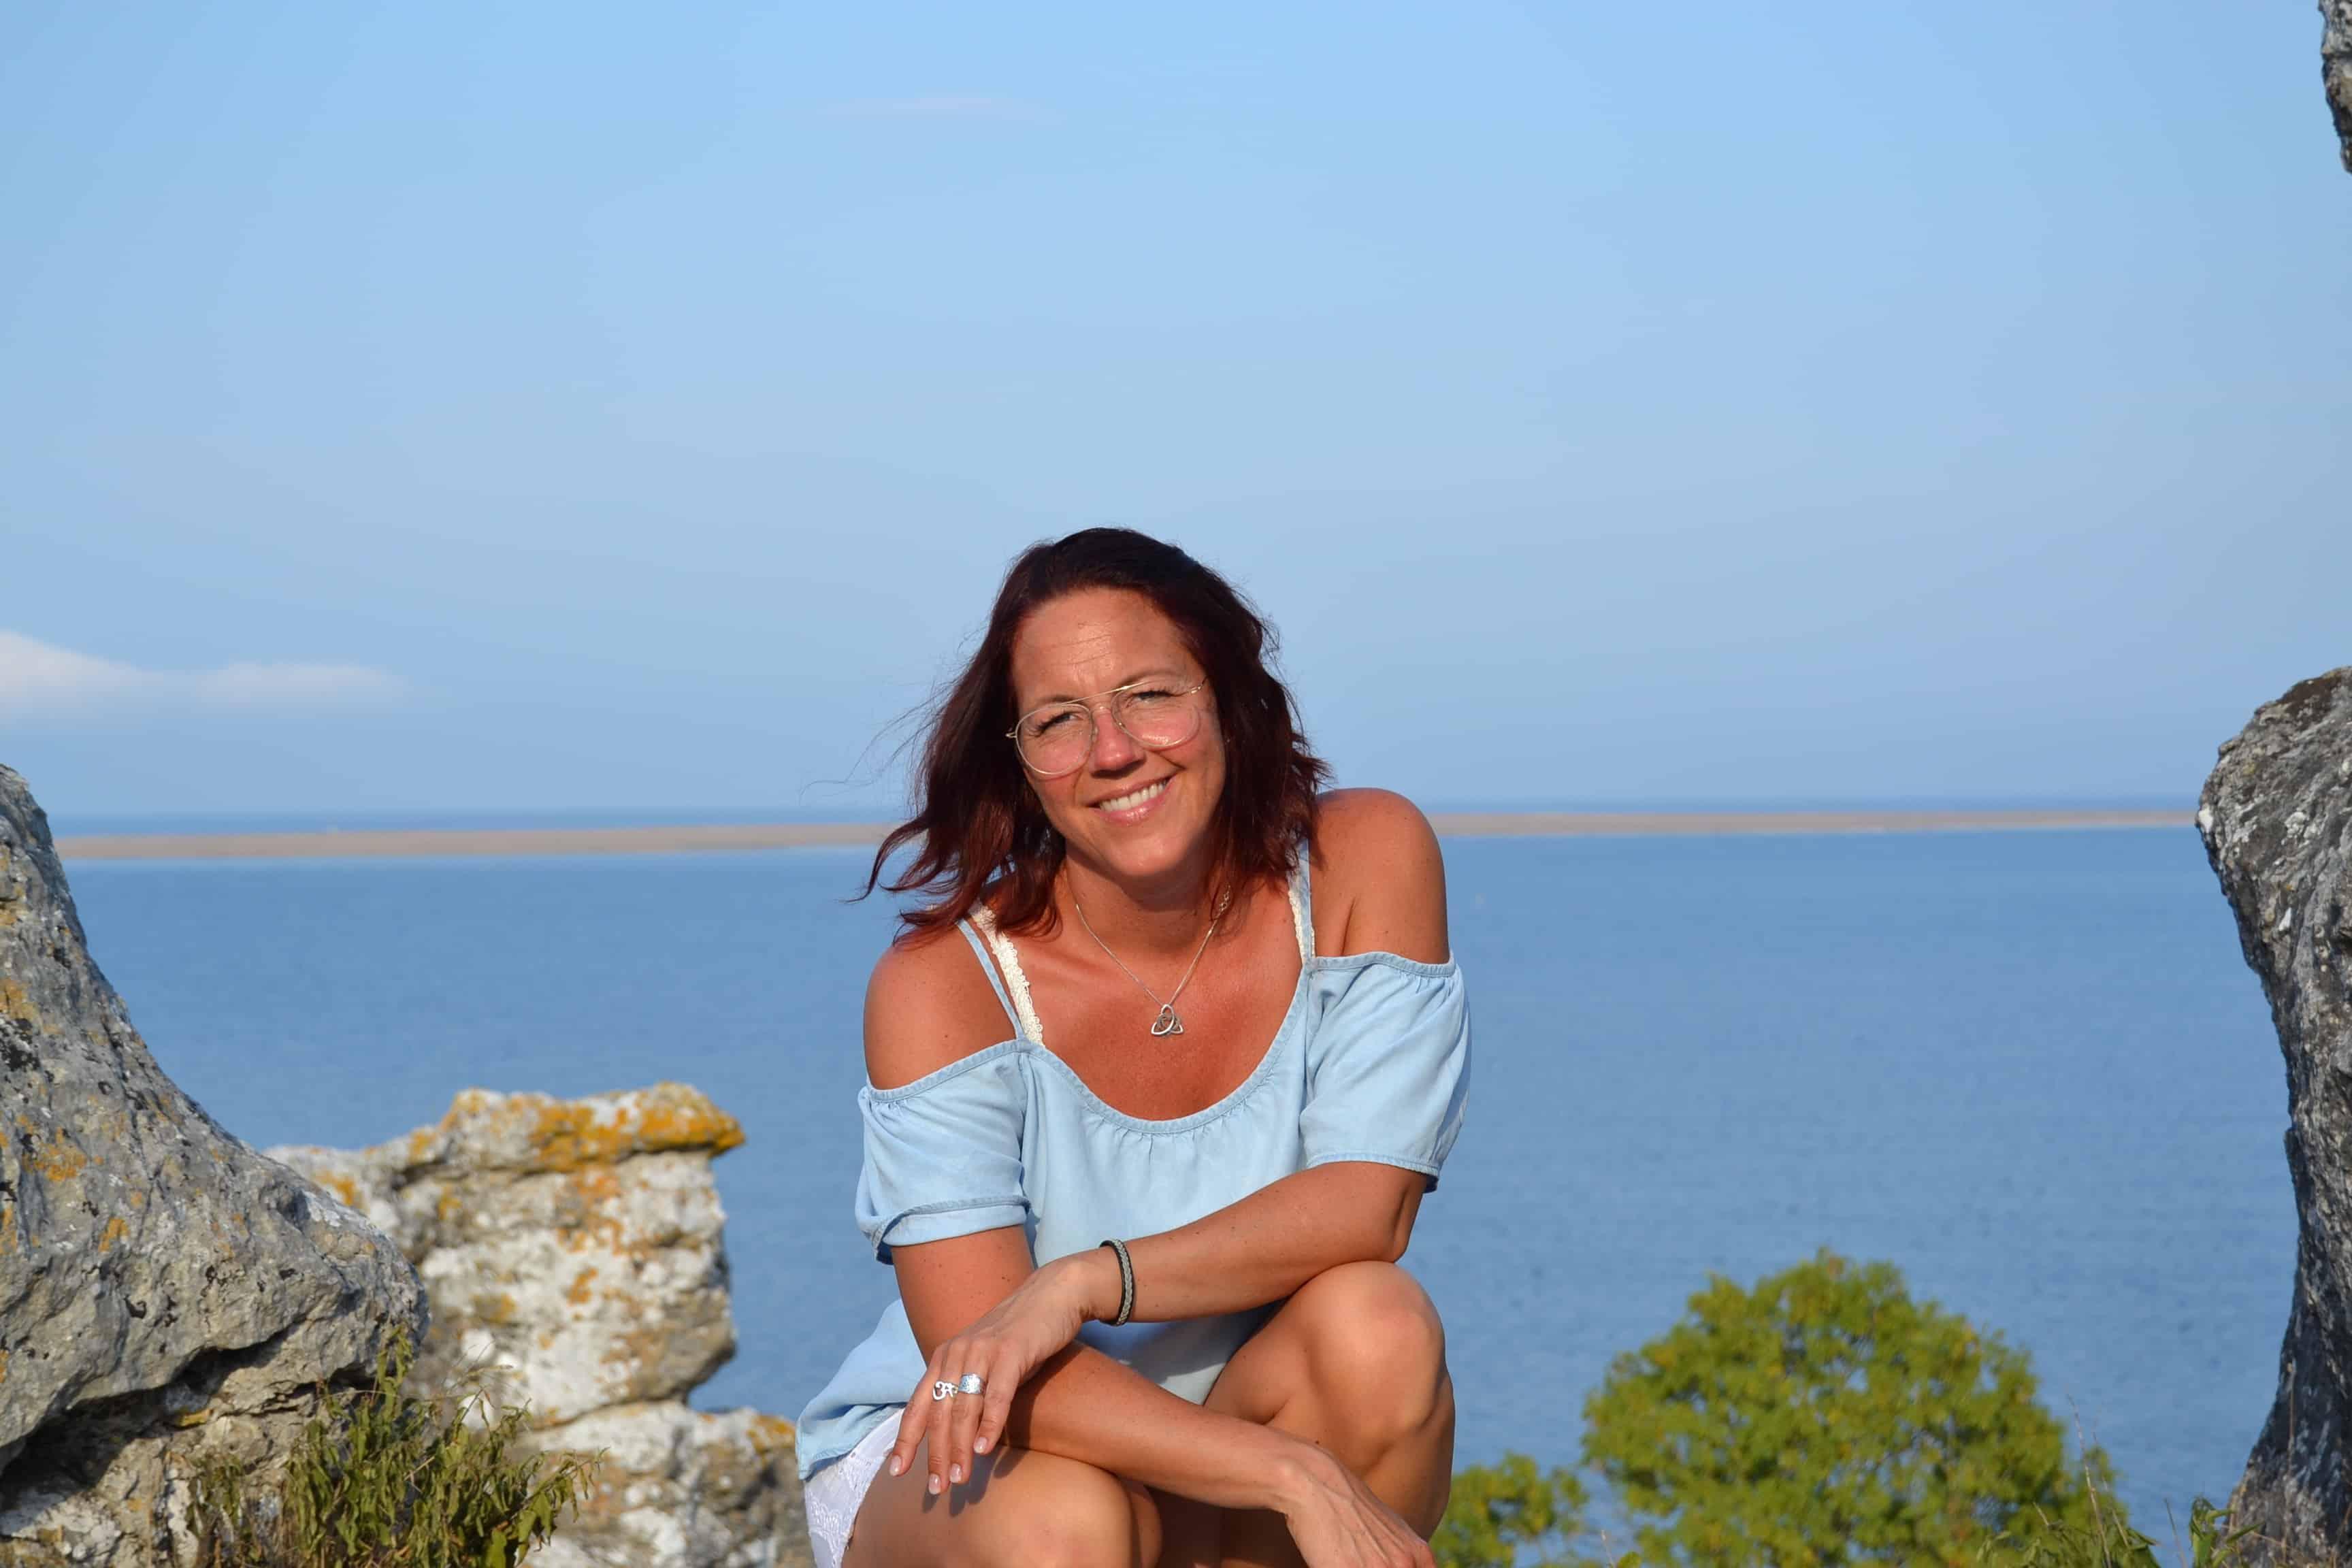 Marita by the sea